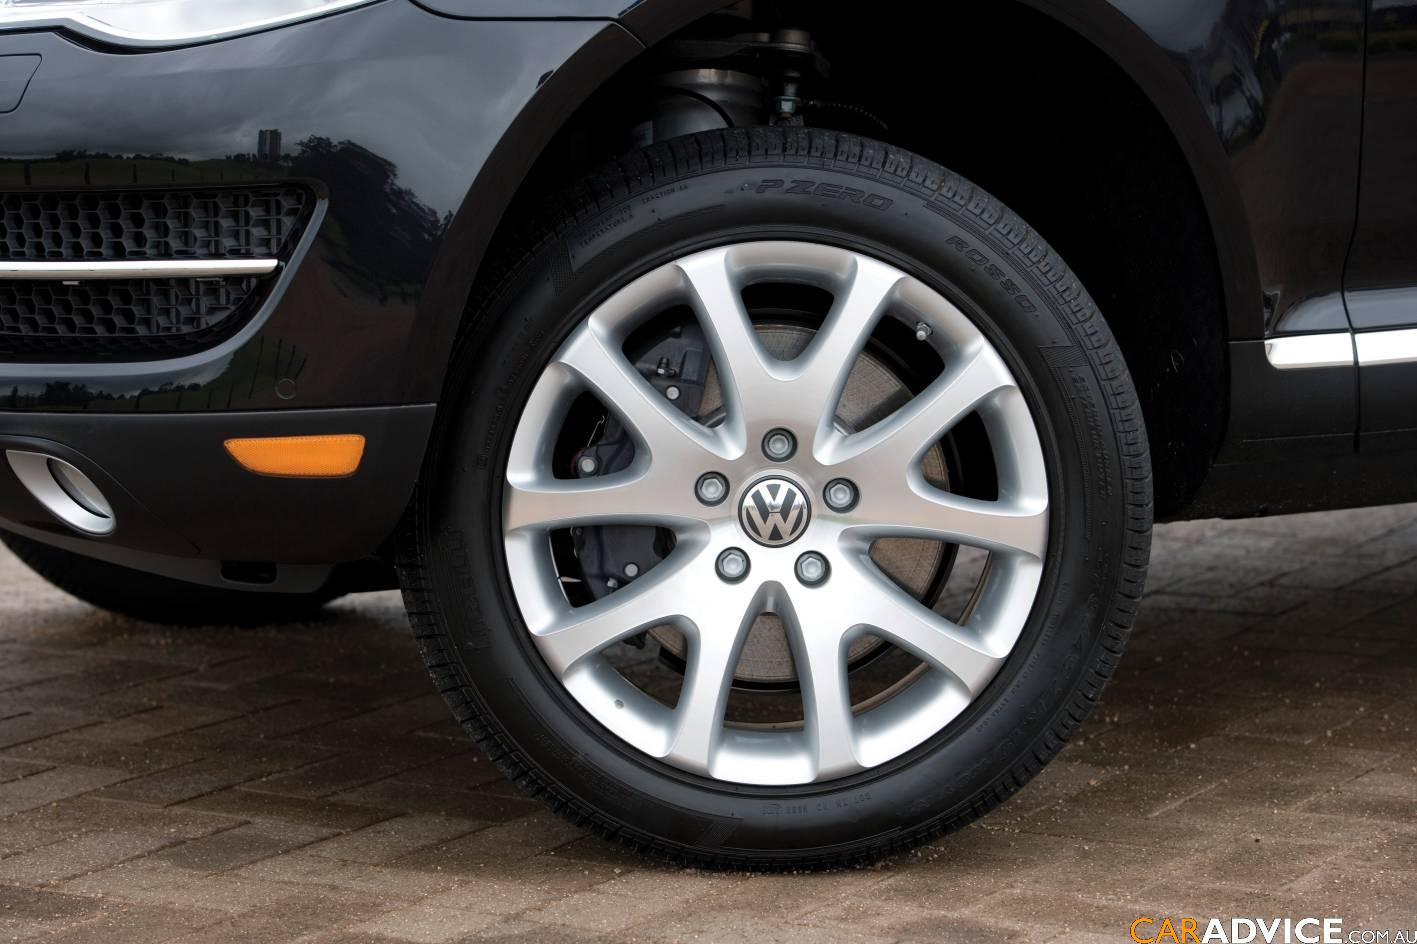 2008 Volkswagen Touareg V10 Tdi Review Caradvice